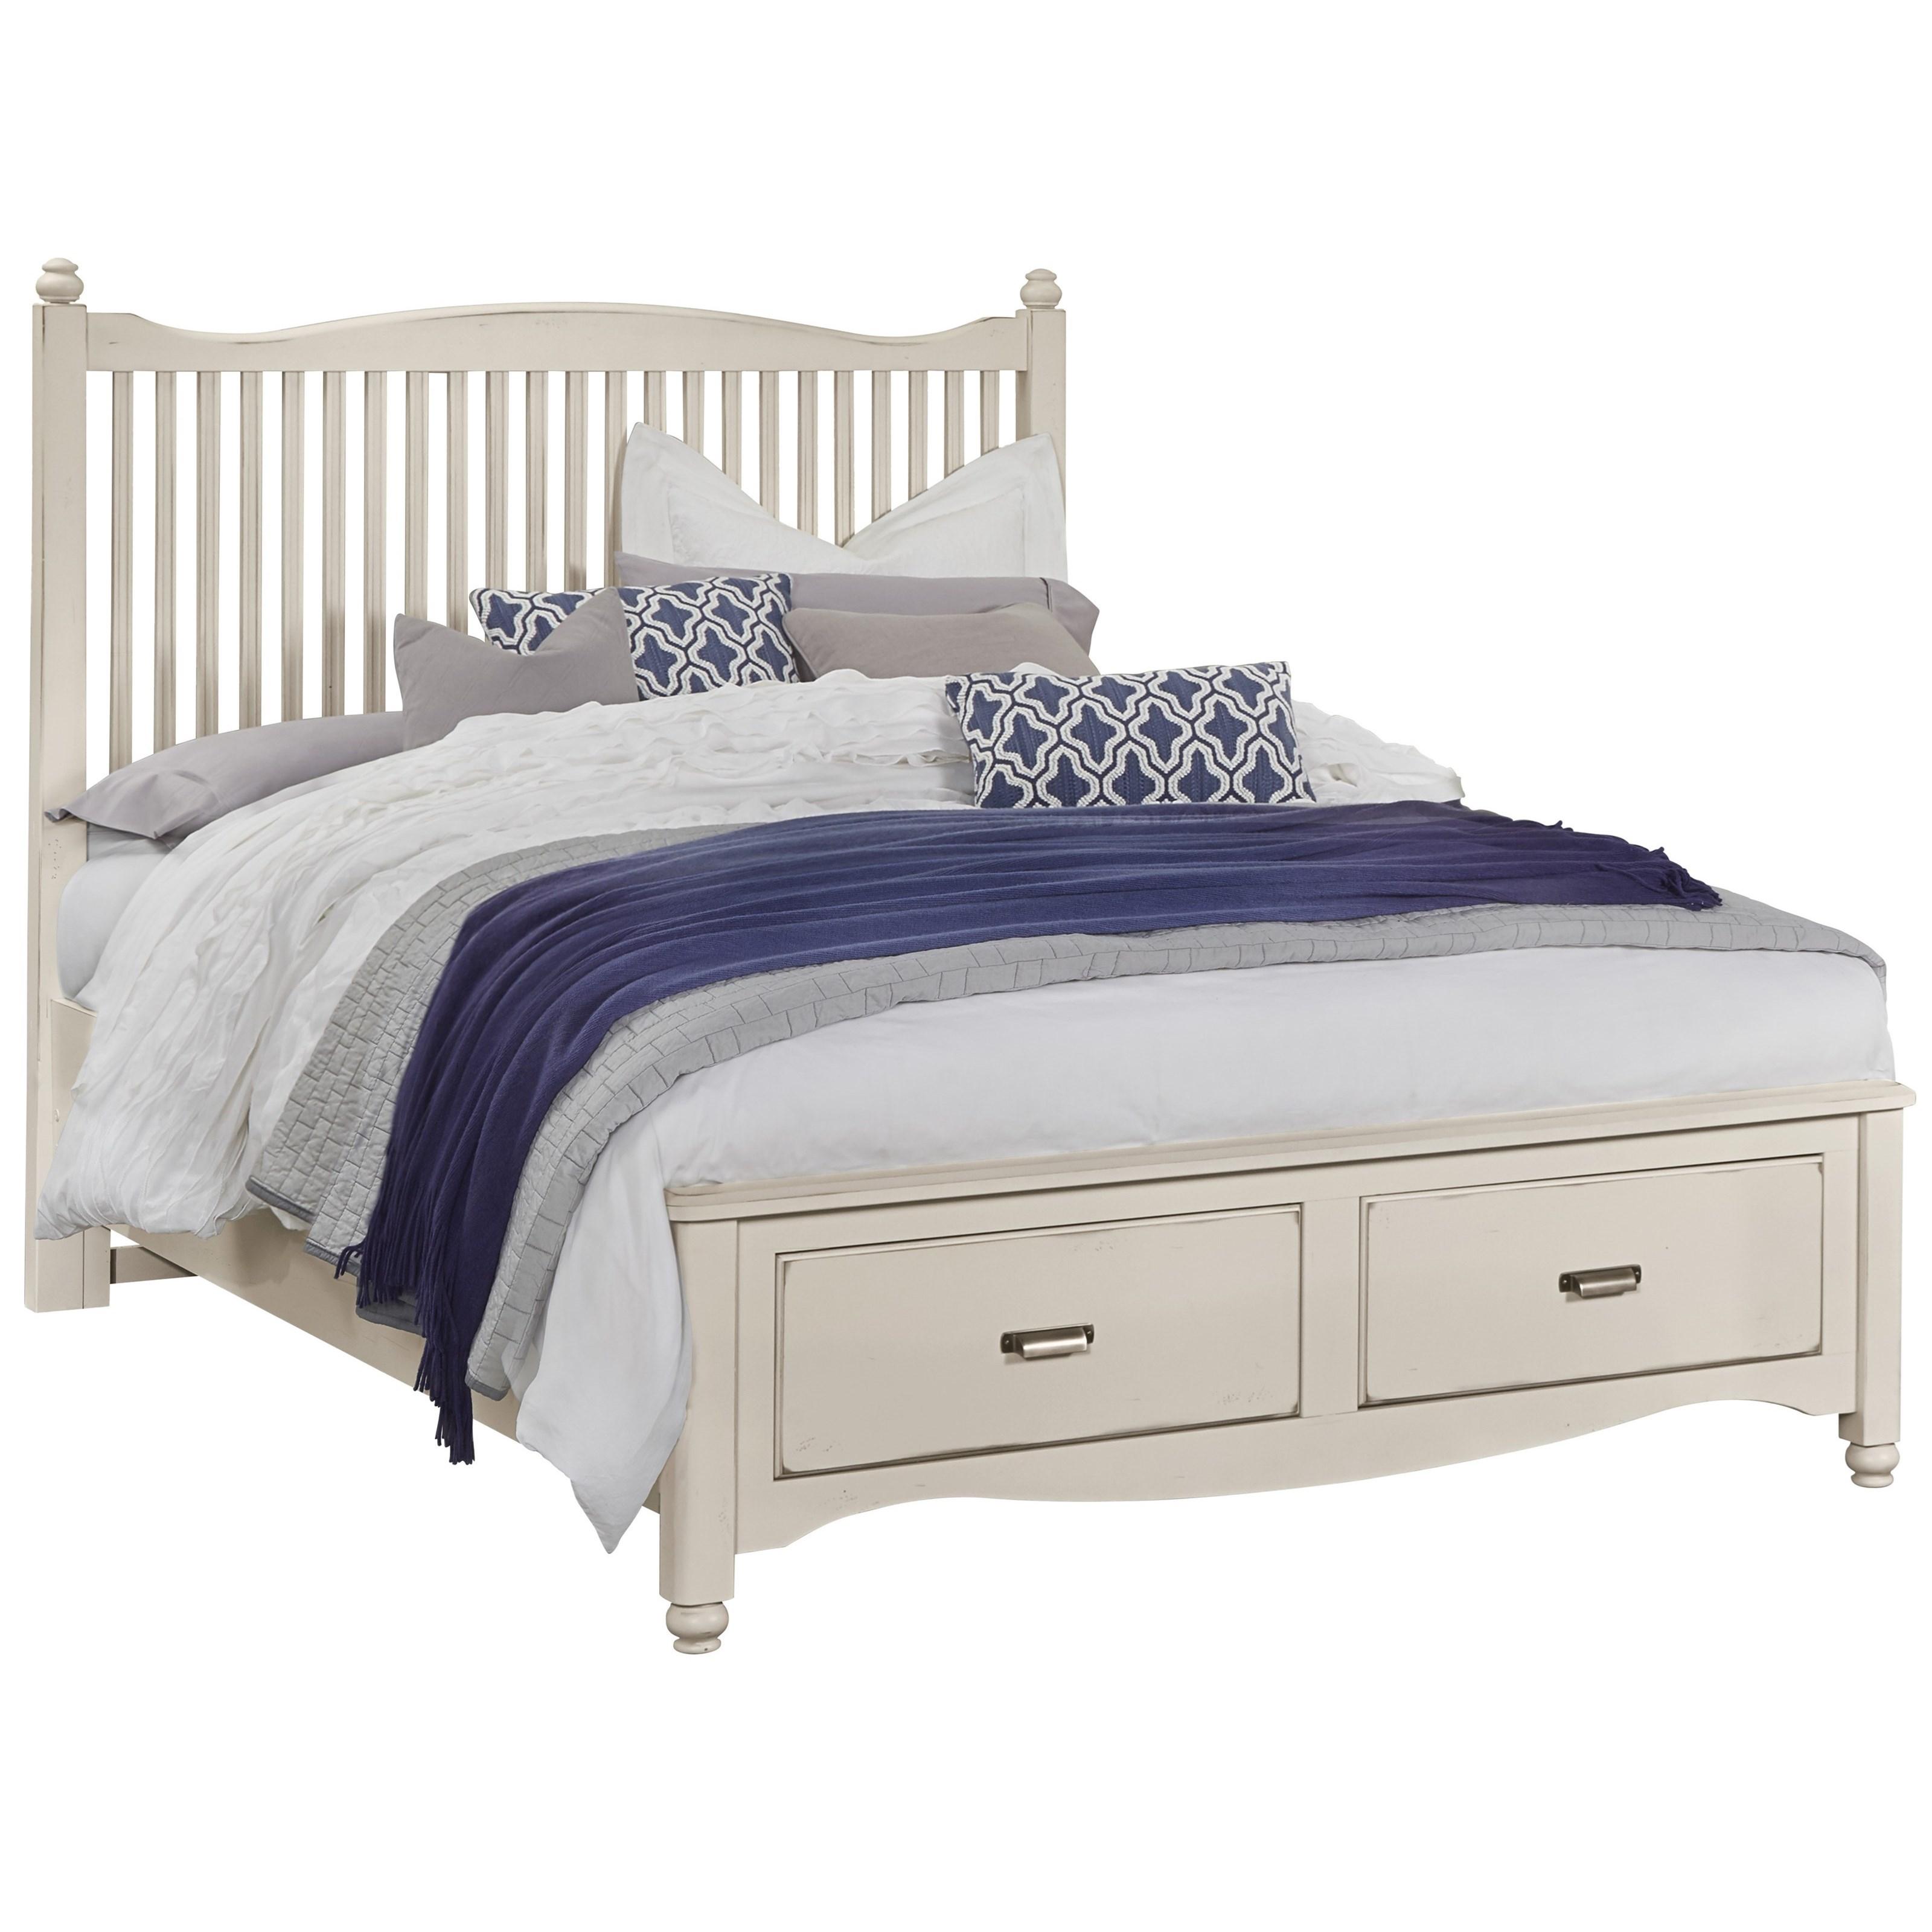 Vaughan Bassett American Maple King Slat Storage Bed - Item Number: 404-667+066B+502+666T